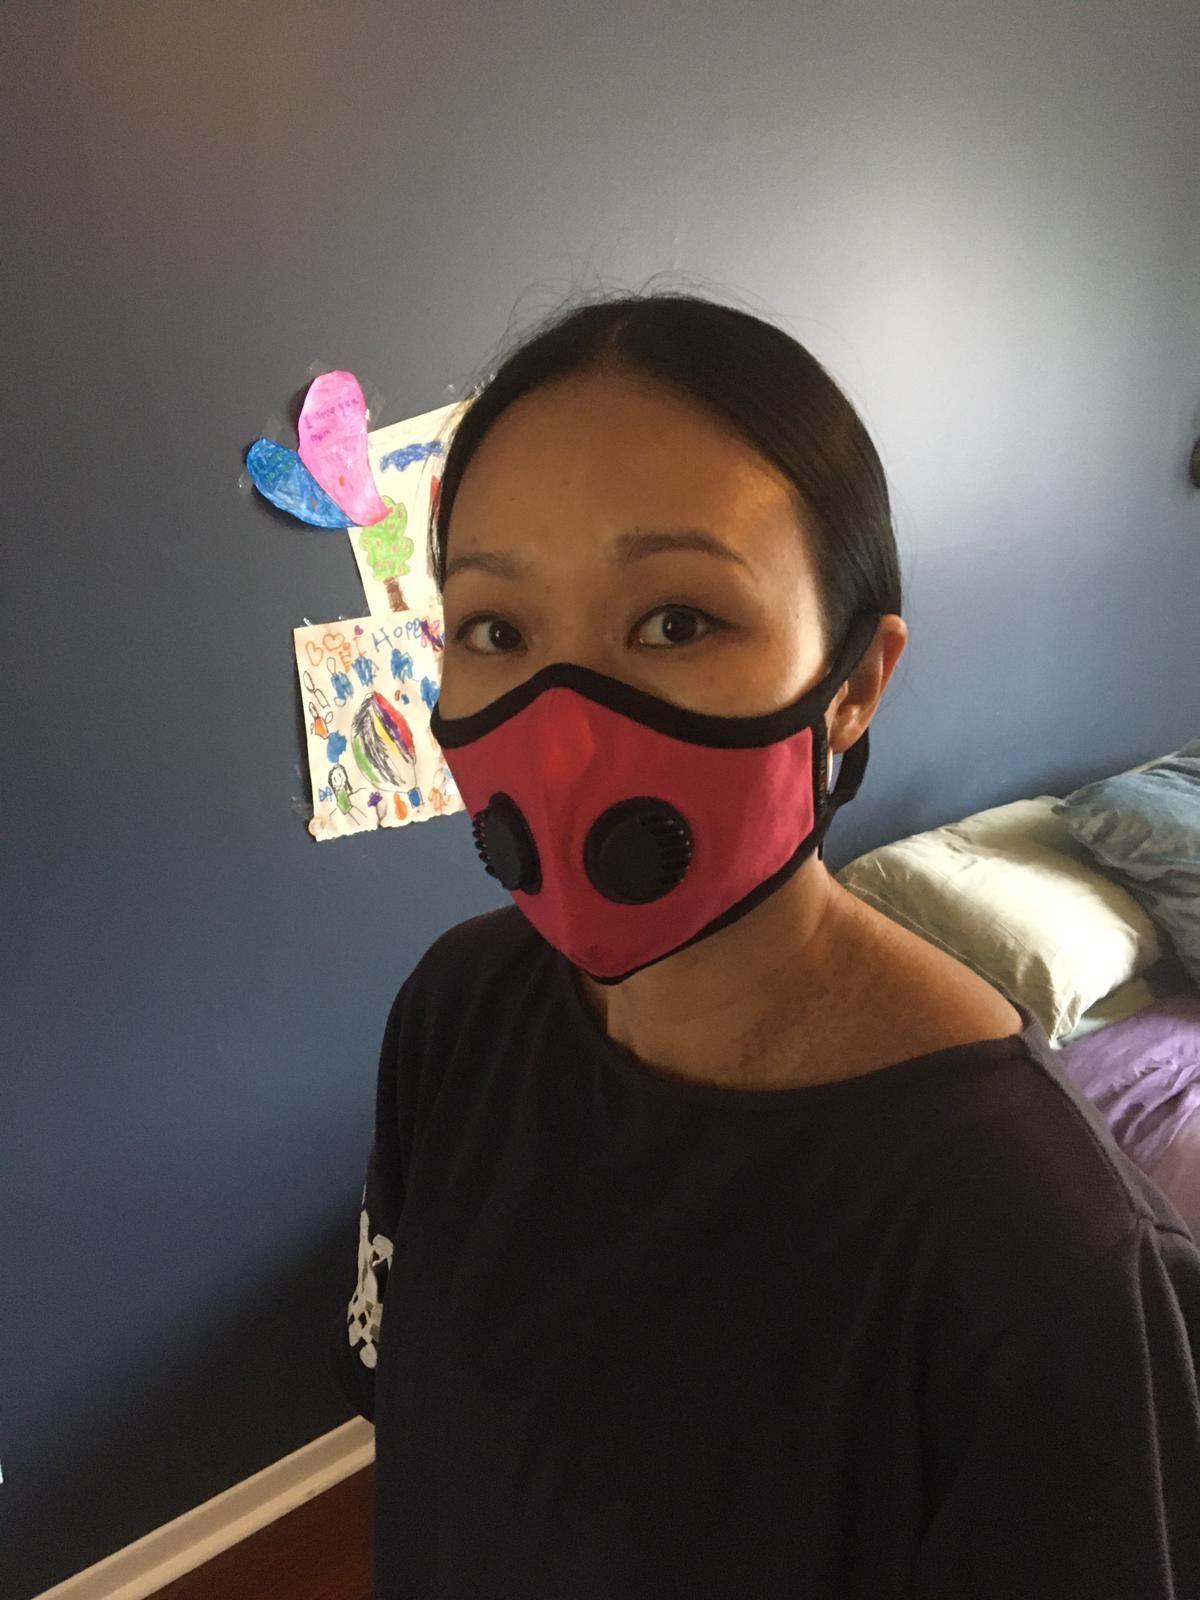 Pin van kandyMask_Girl op Mondkapjes in actie in 2020